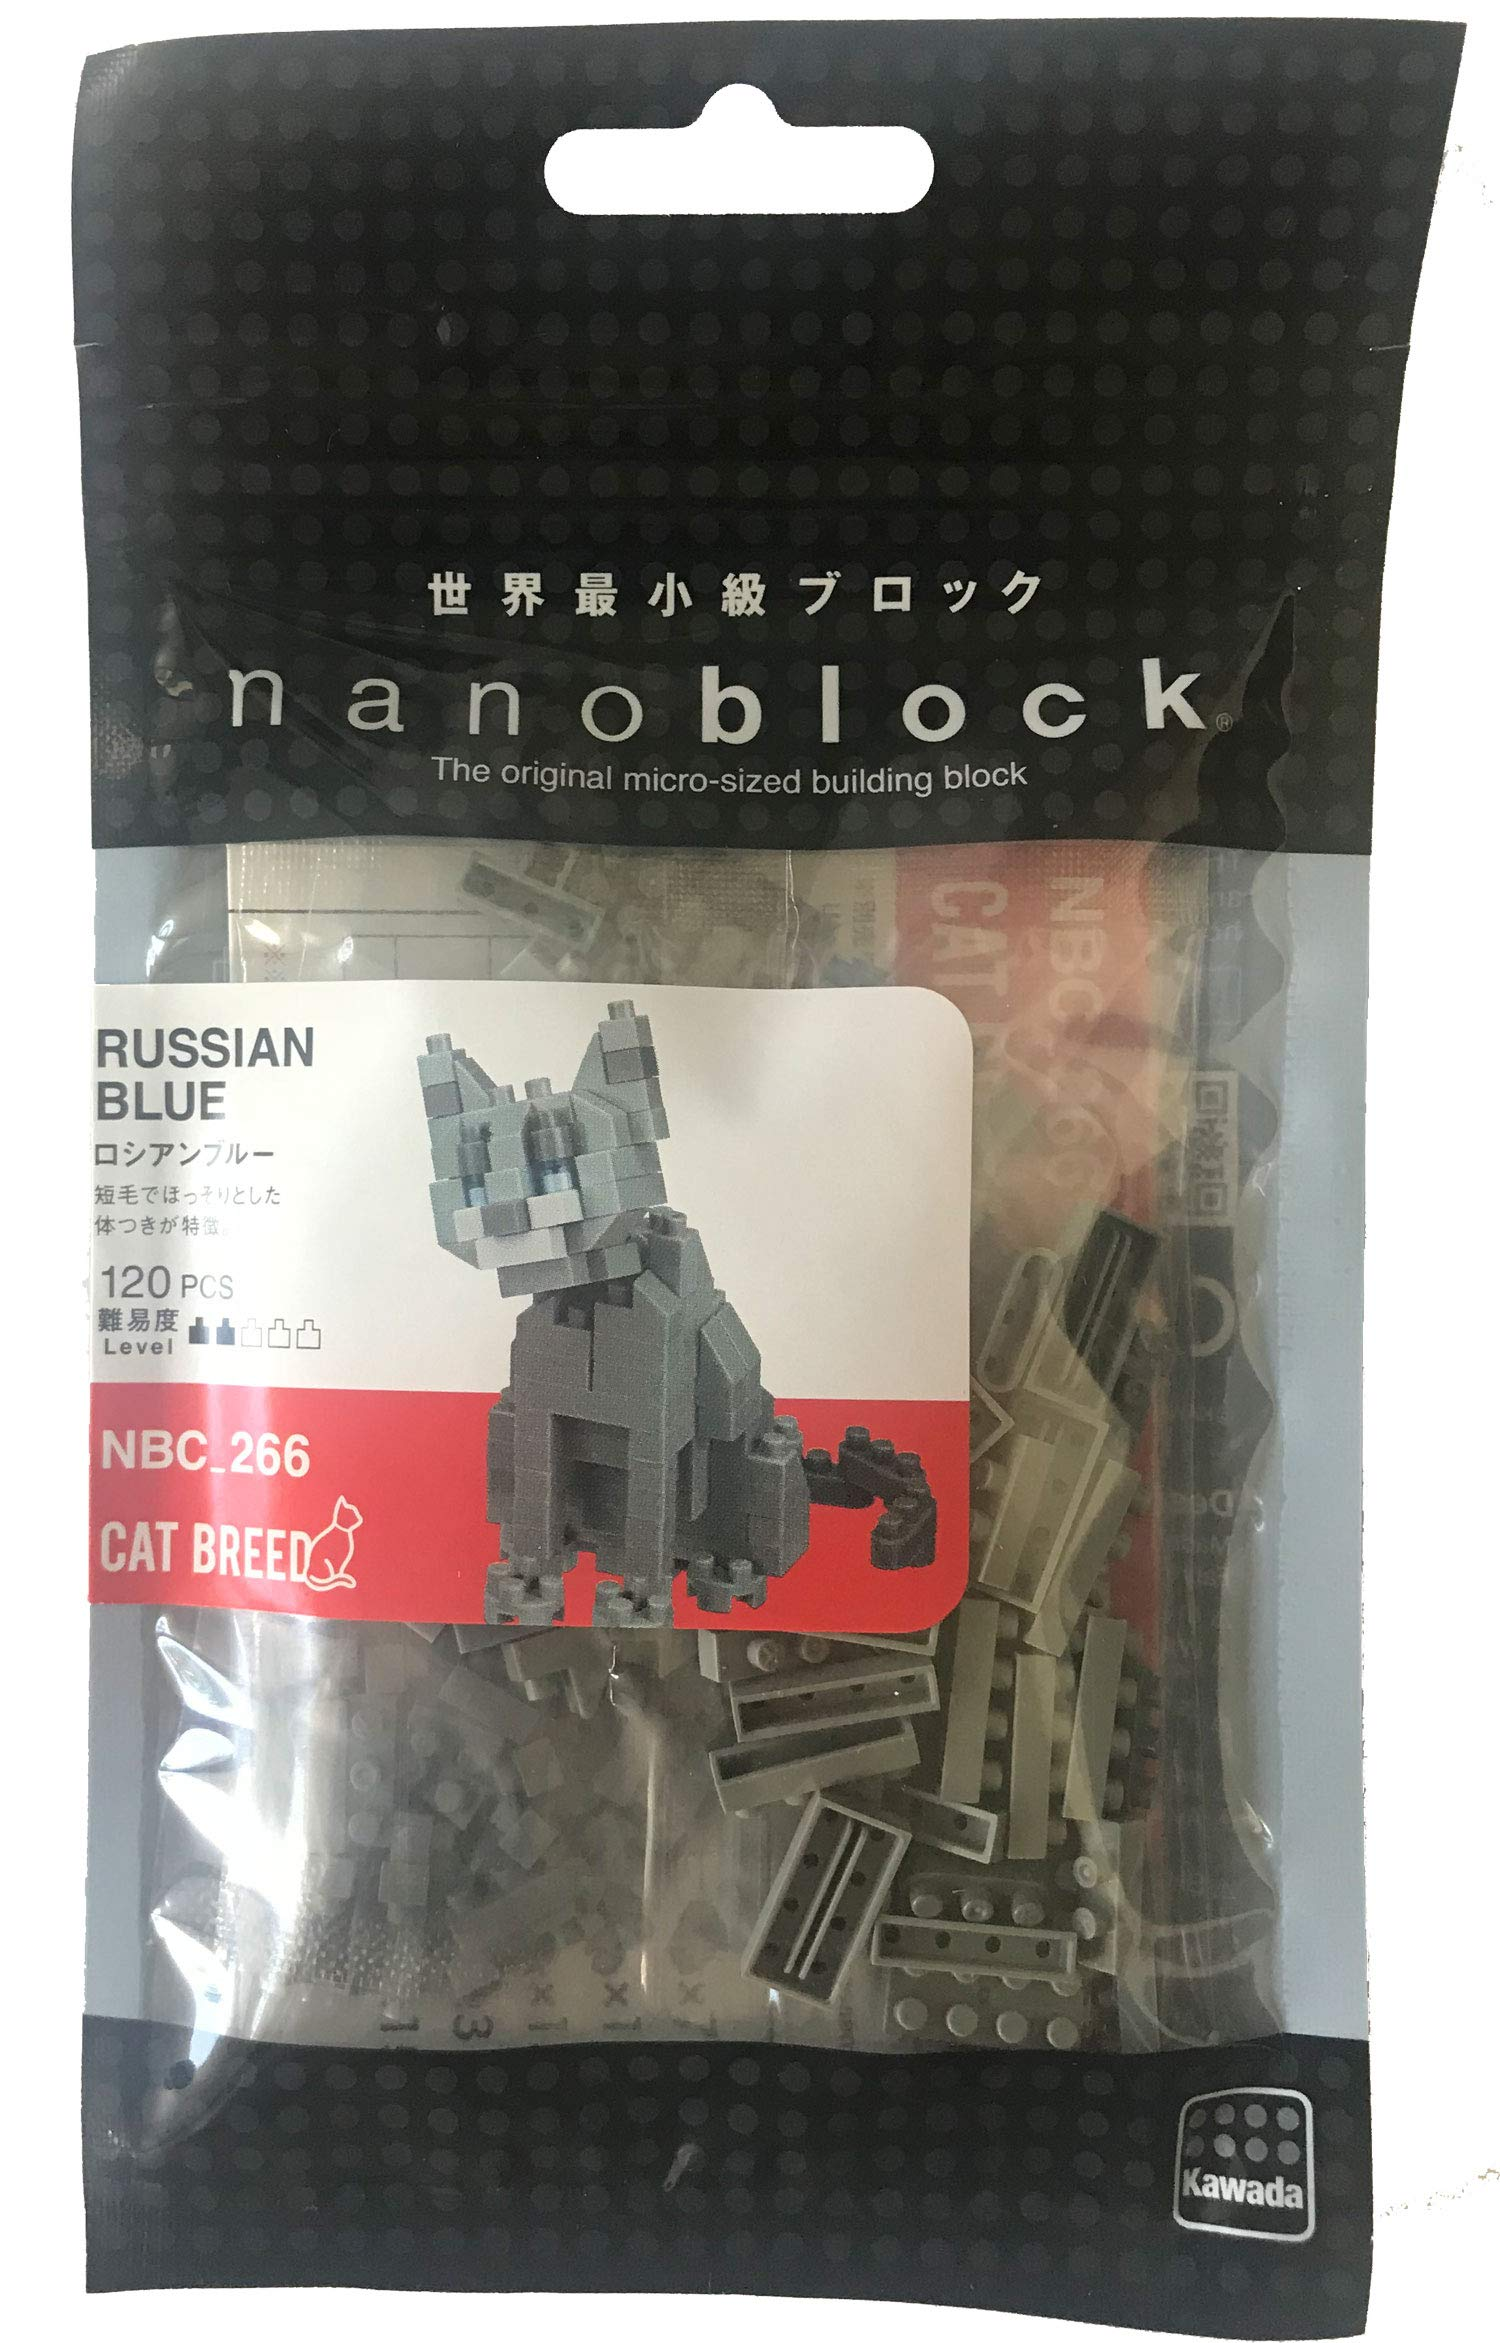 Nanoblocks 2 Sets - Famous Cats - Russian Blue and Calico Cat - Bundled Sets (Japan Import) 5